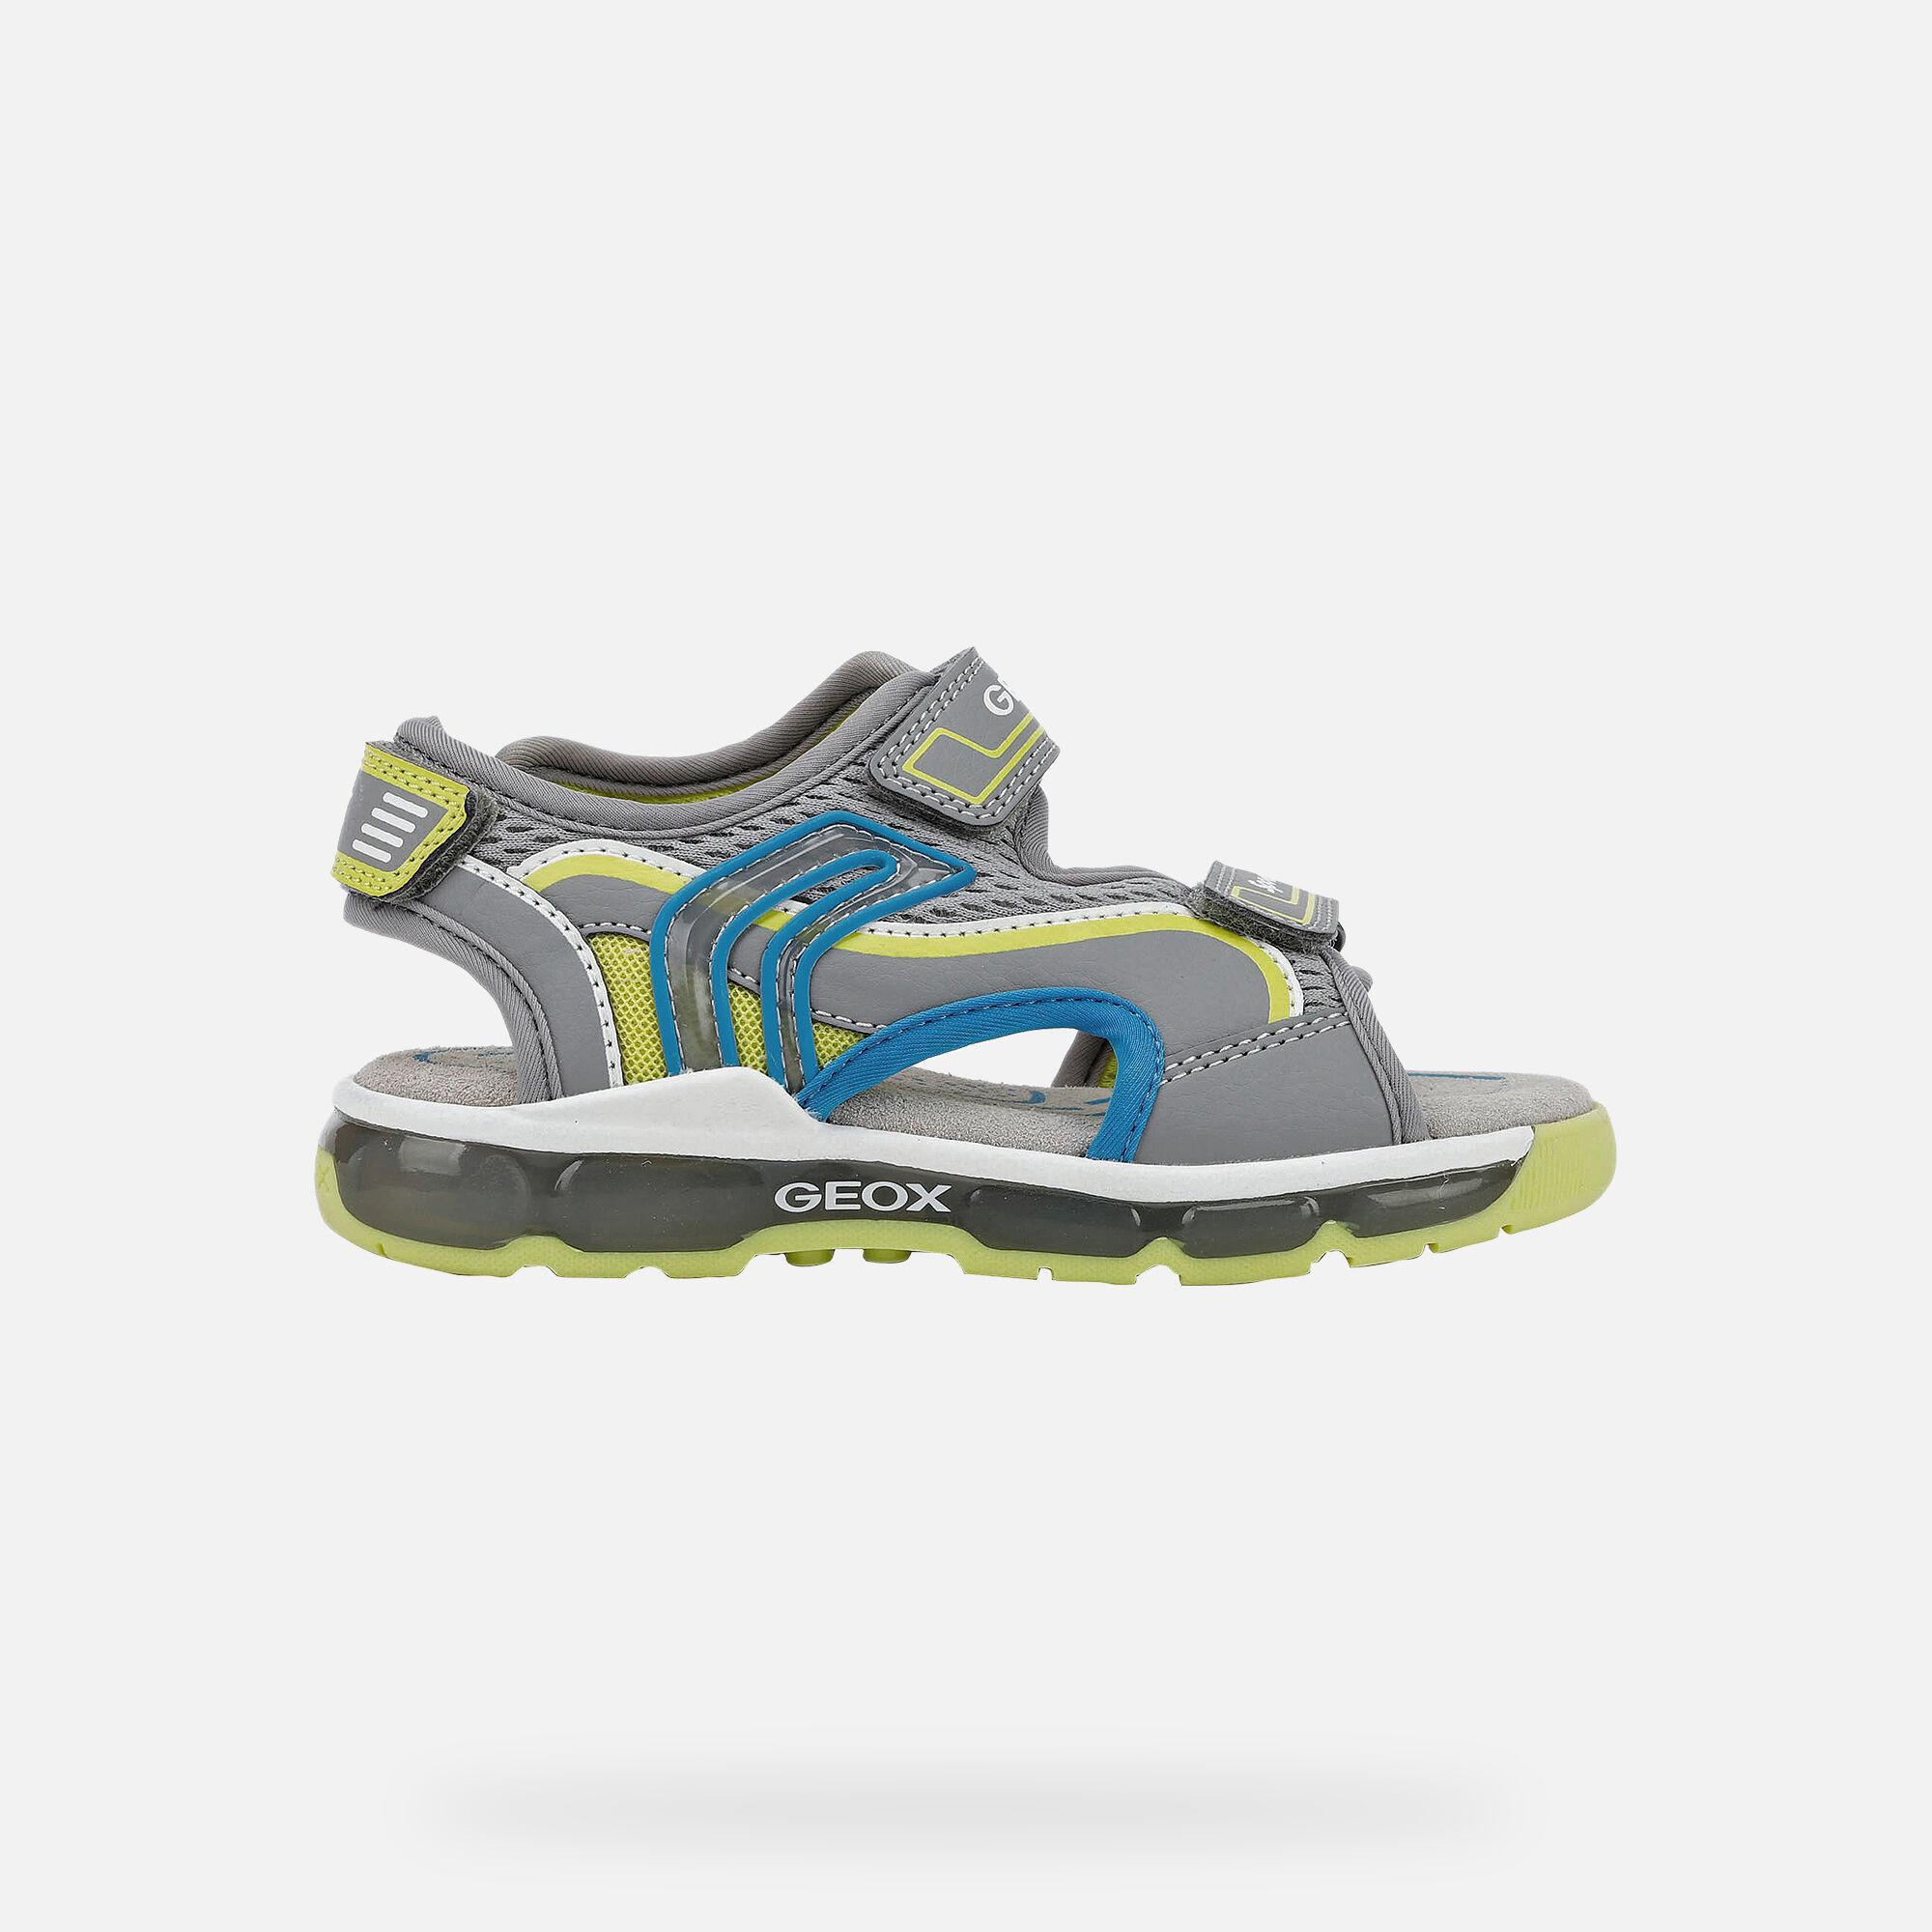 Geox light up sandals